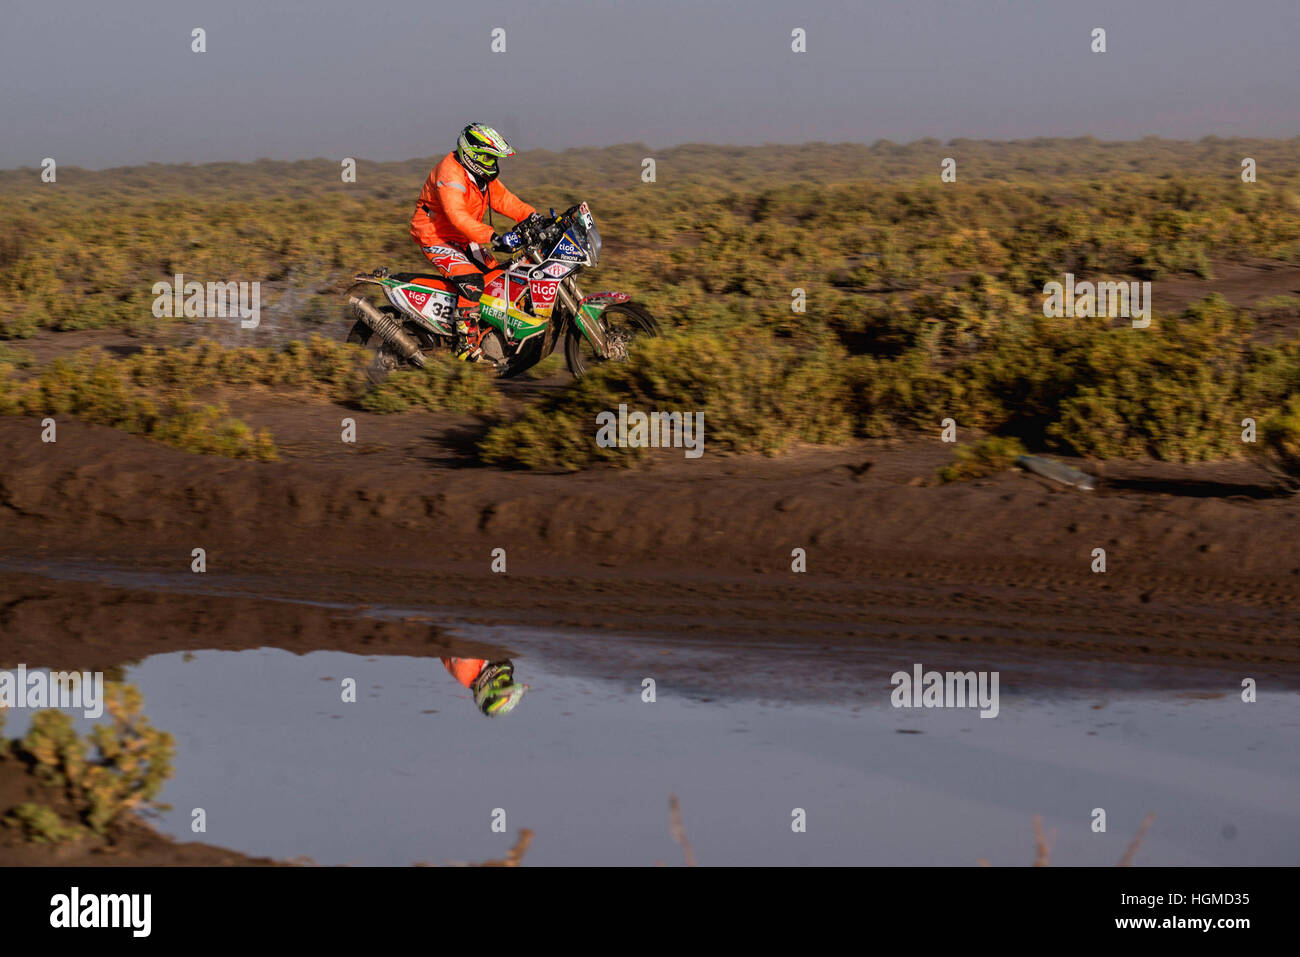 LA PAZ, LP - 10.01.2017: RALLY DAKAR 2017 - 032 Juan Carlos Salvatierra (BOL) KTM in the Dakar Rally 2017 on Tuesday - Stock Image